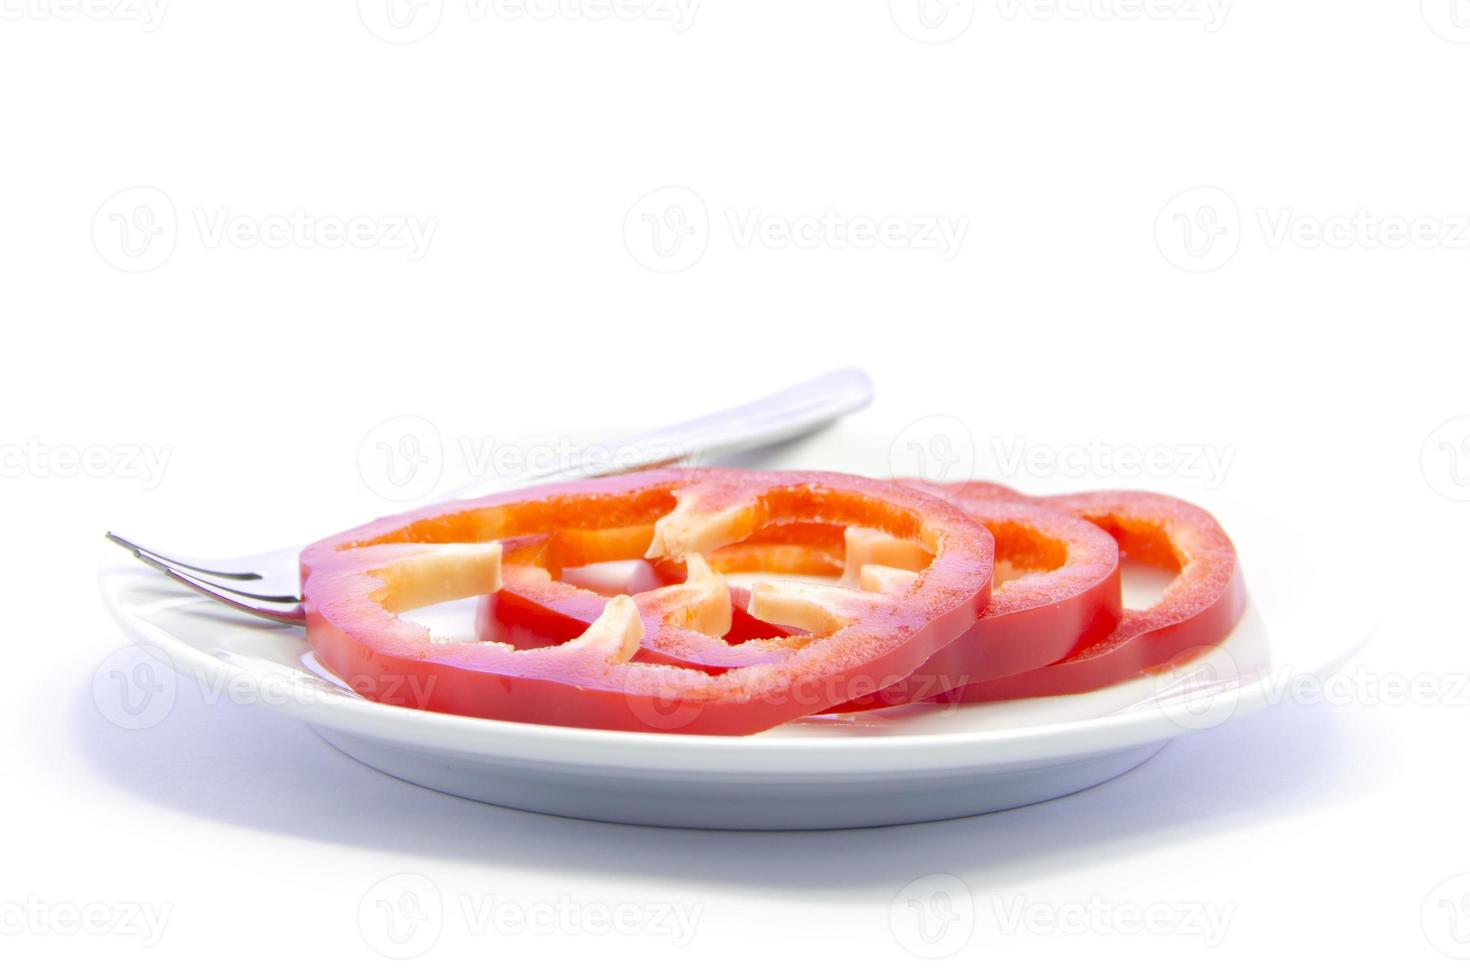 pimentão vermelho sino fatiado ingrediente na chapa branca foto